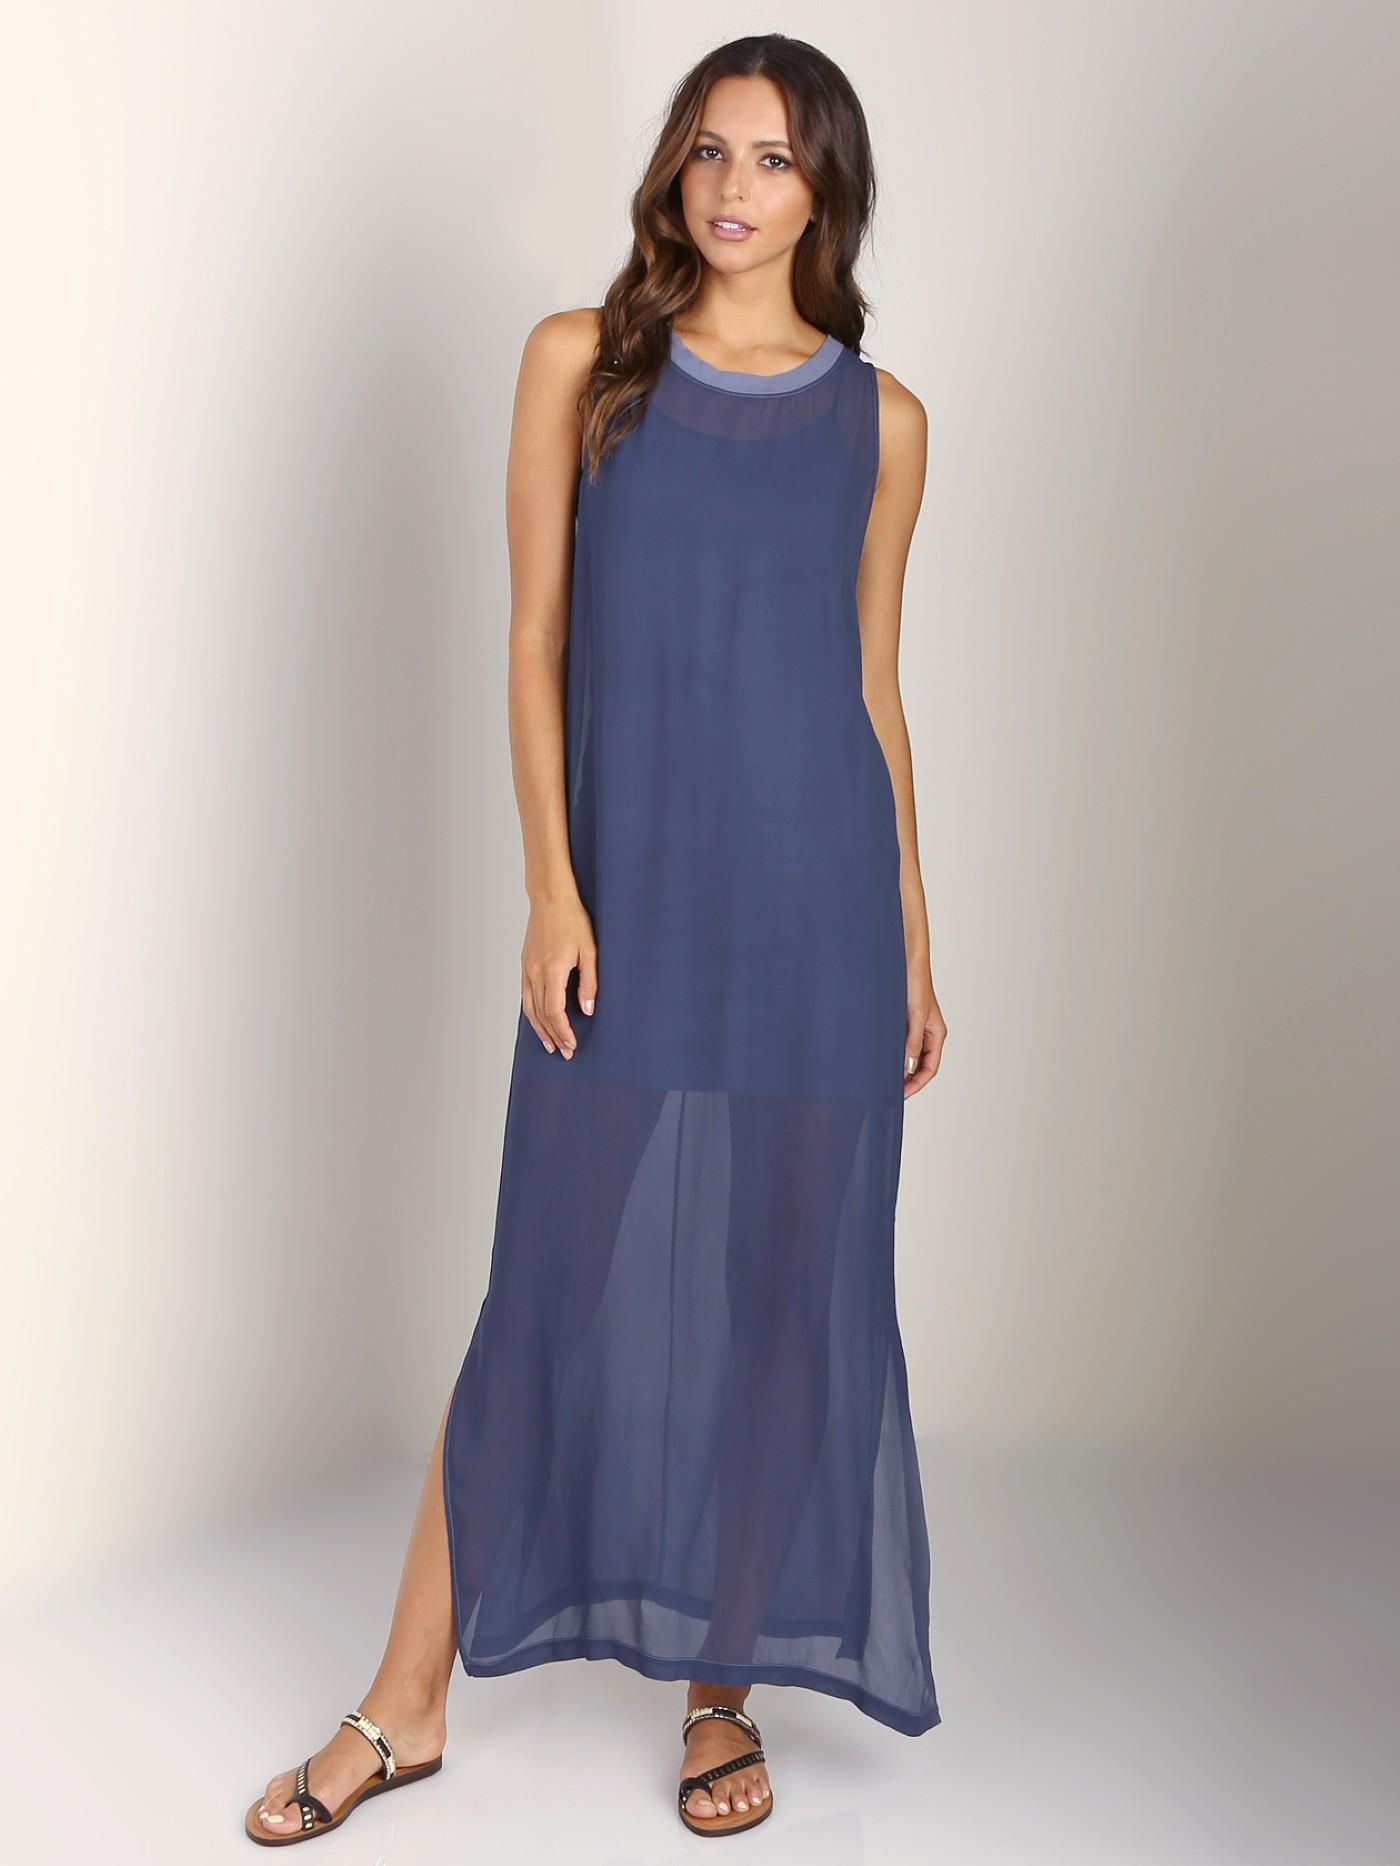 LACAUSA Dad s Shirtdress Vintage Blue LA30001 - Free Shipping at Largo Drive 00e527467